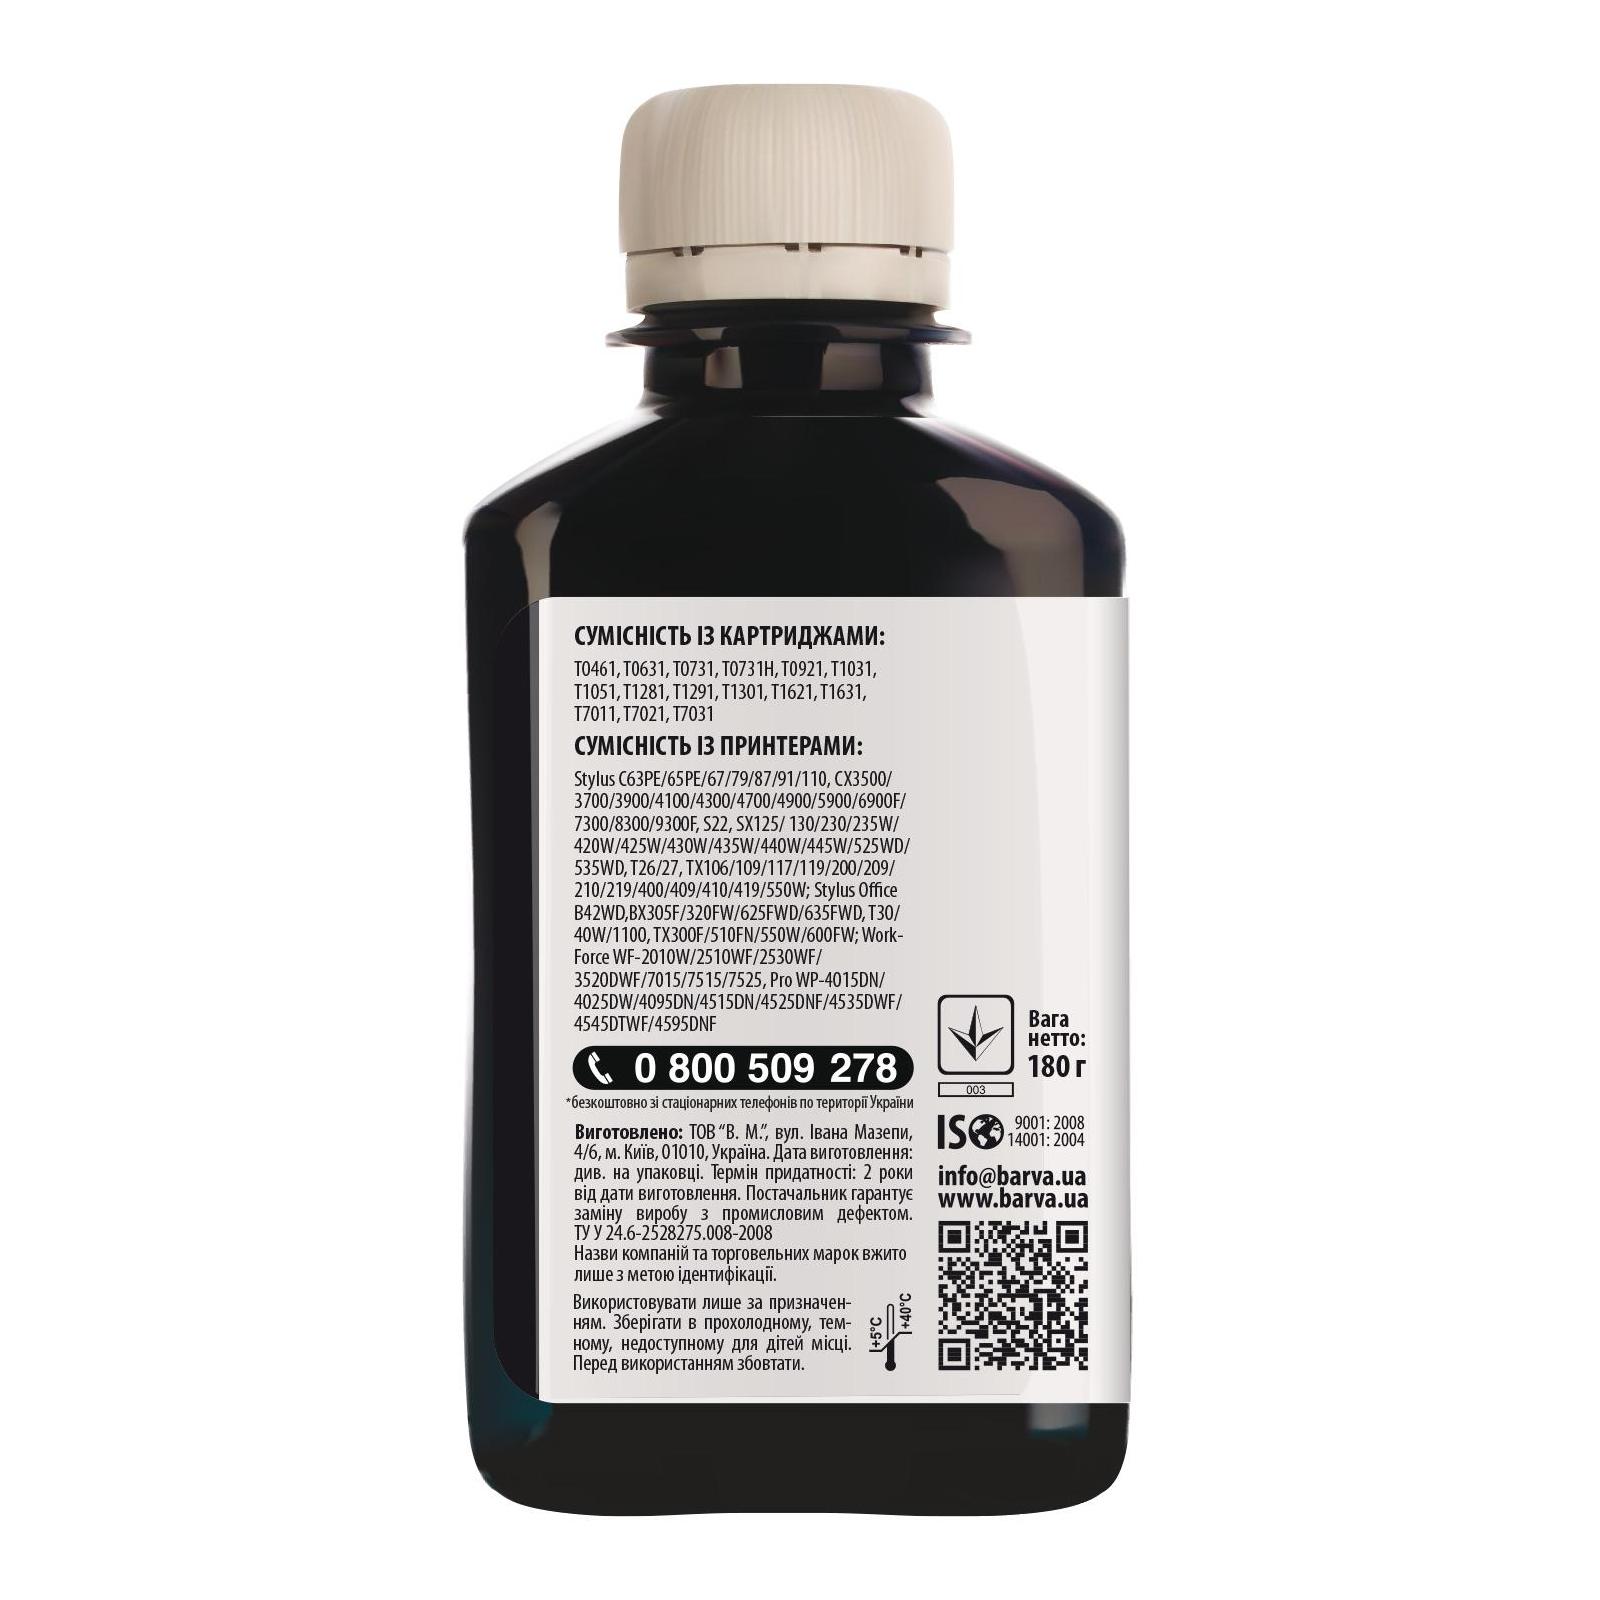 Чернила BARVA Epson T1301/T1291/T1281/T1031/T0731 Black 180 г pigm. (E130-535) изображение 2